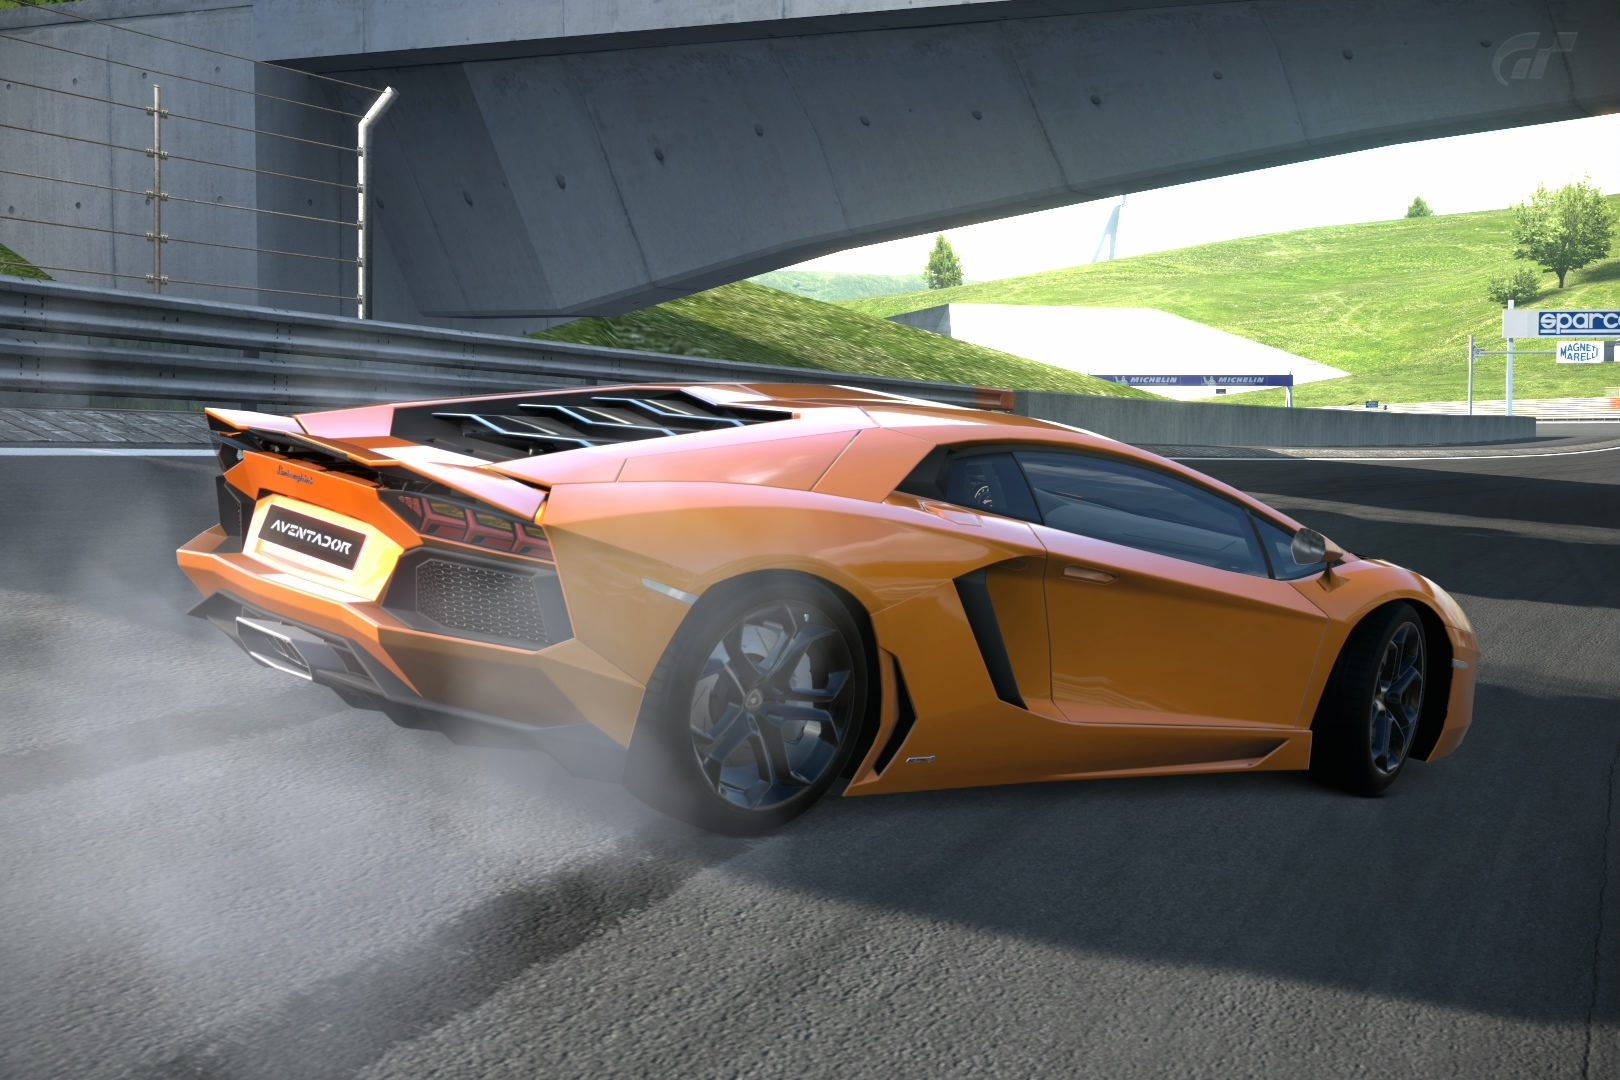 AventadorDriftImg1.jpg